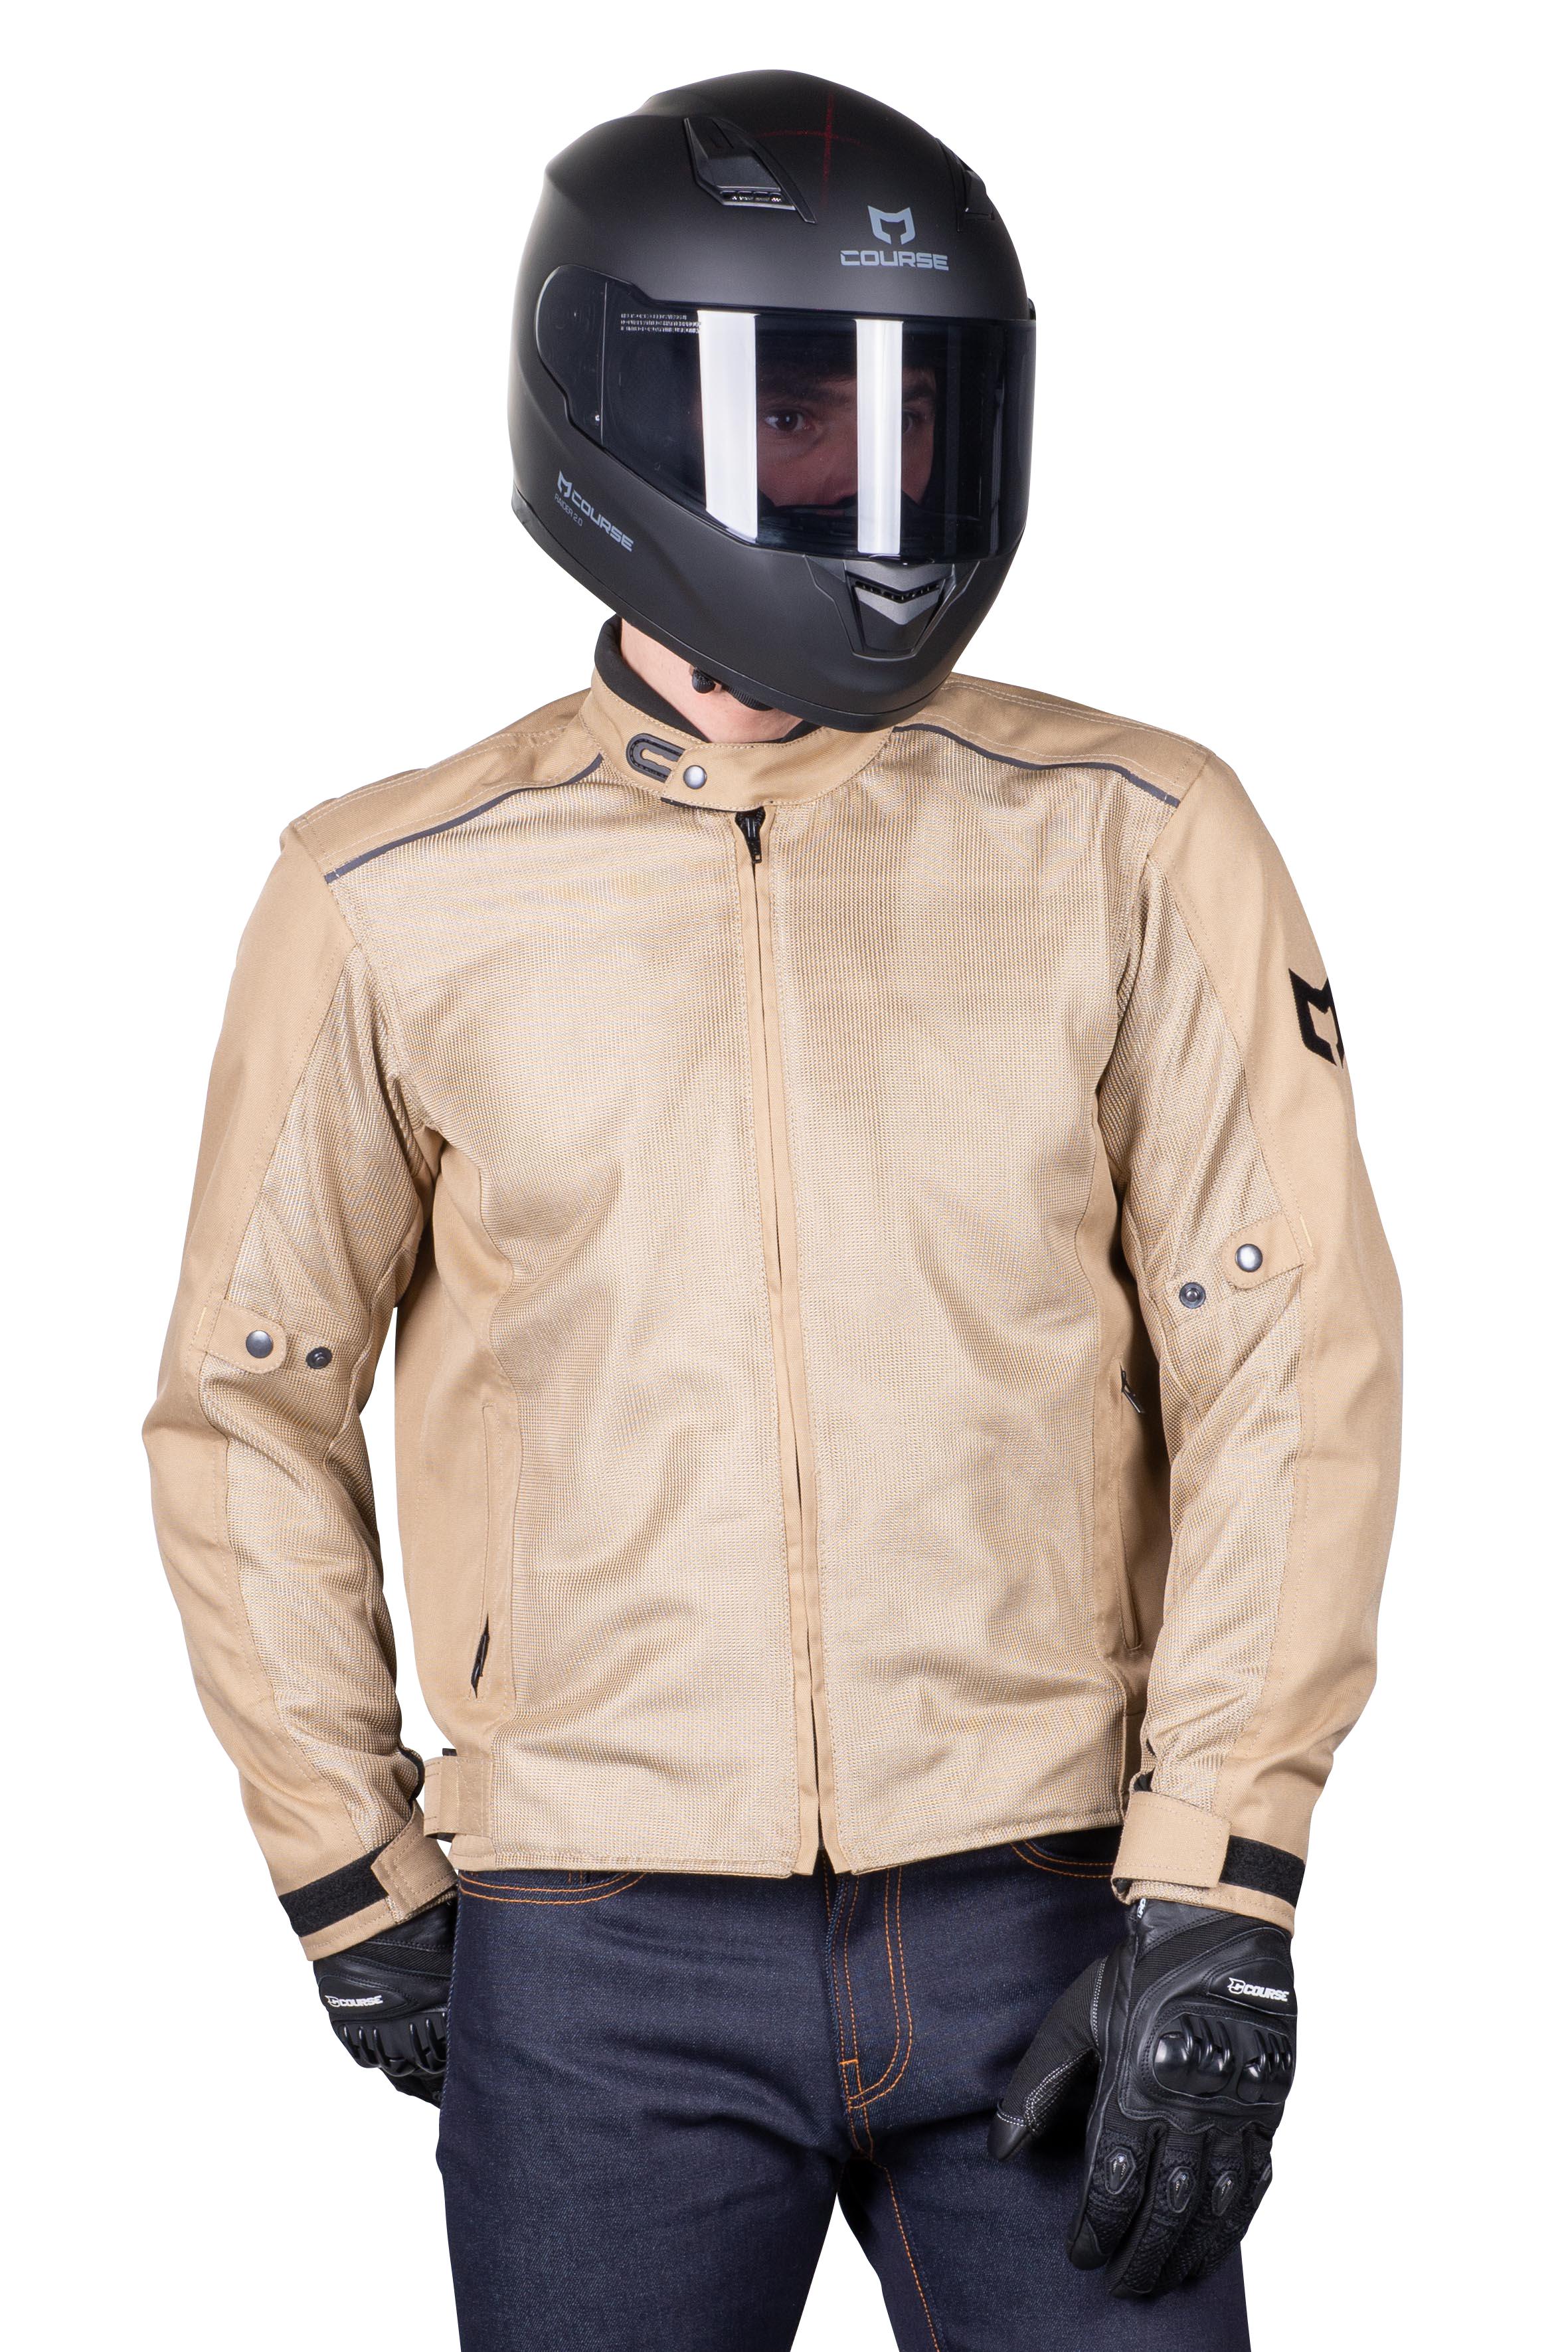 Course Giacca Moto Vento Mesh Sabbia